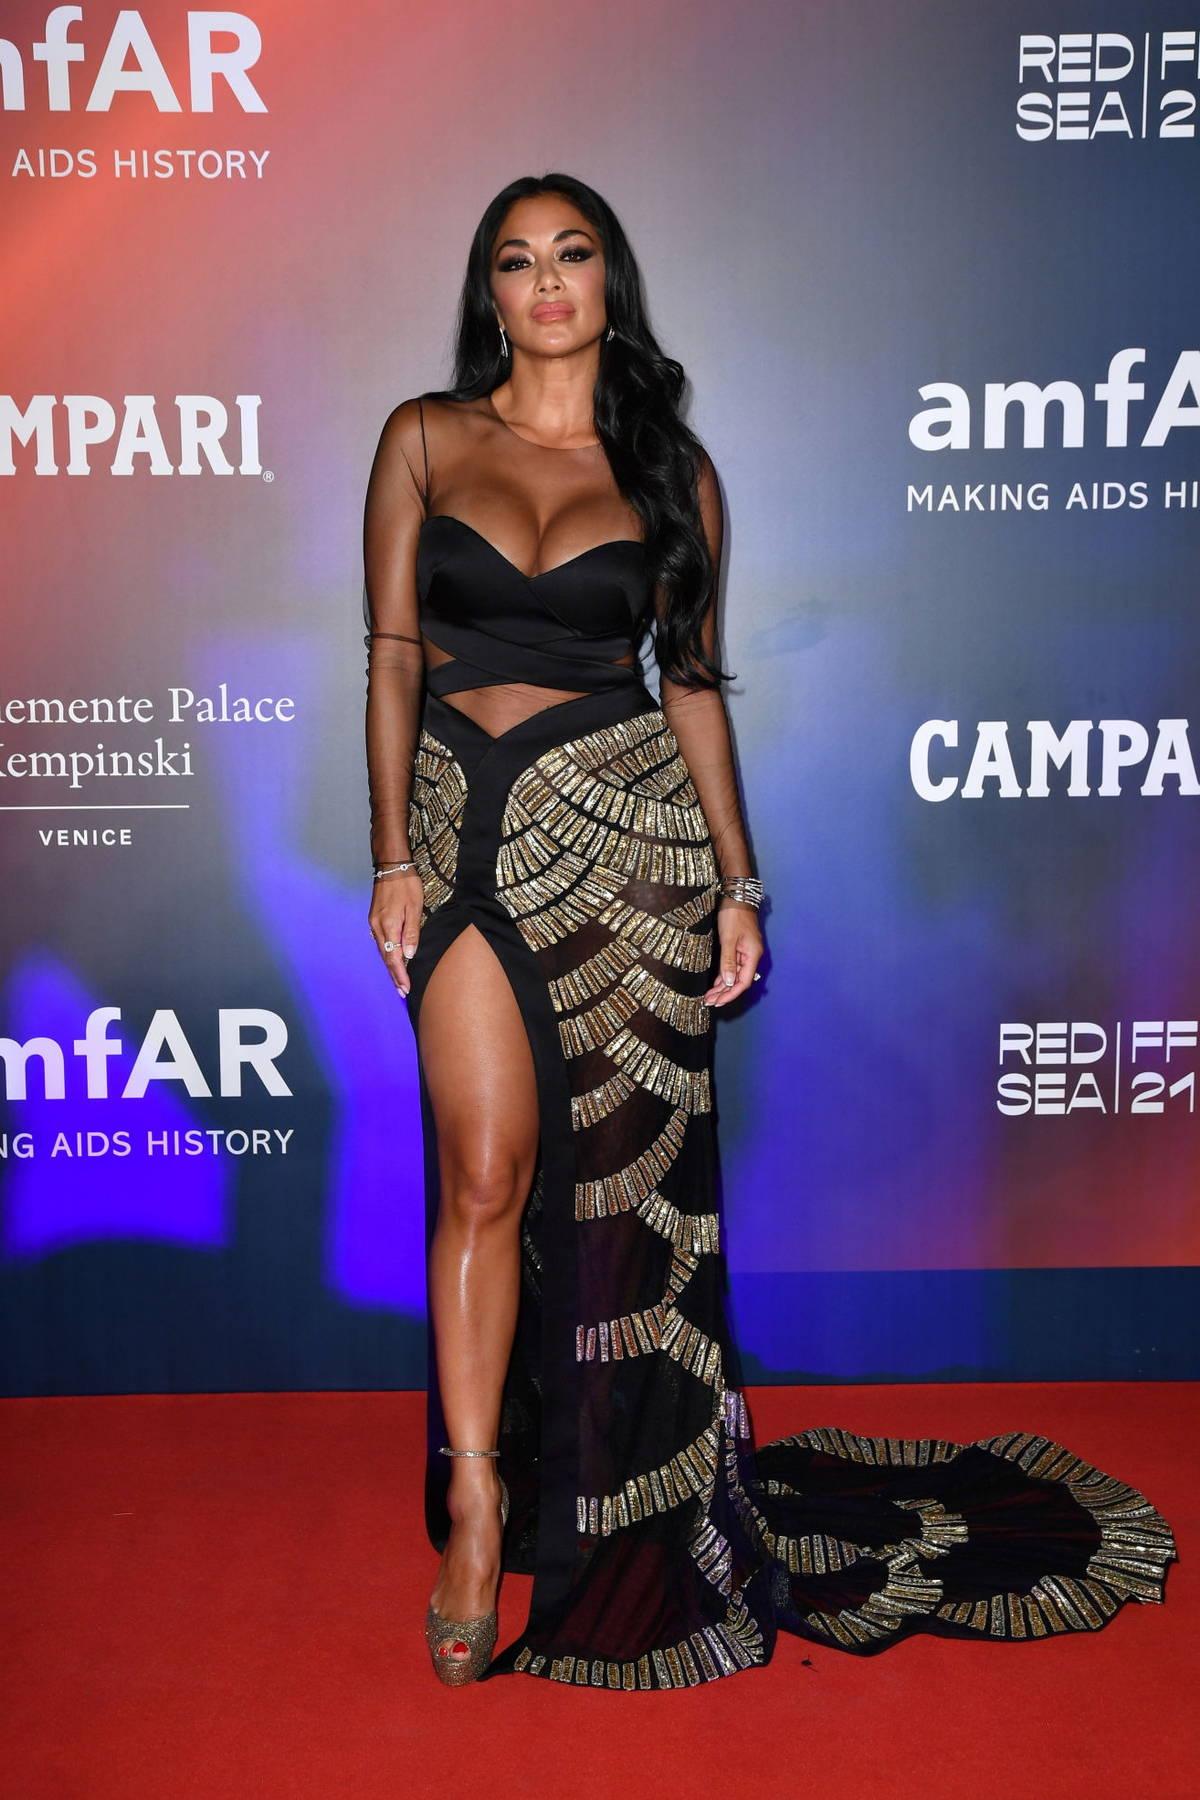 Nicole Scherzinger attends the 2021 amfAR Gala during the 78th Venice International Film Festival in Venice, Italy